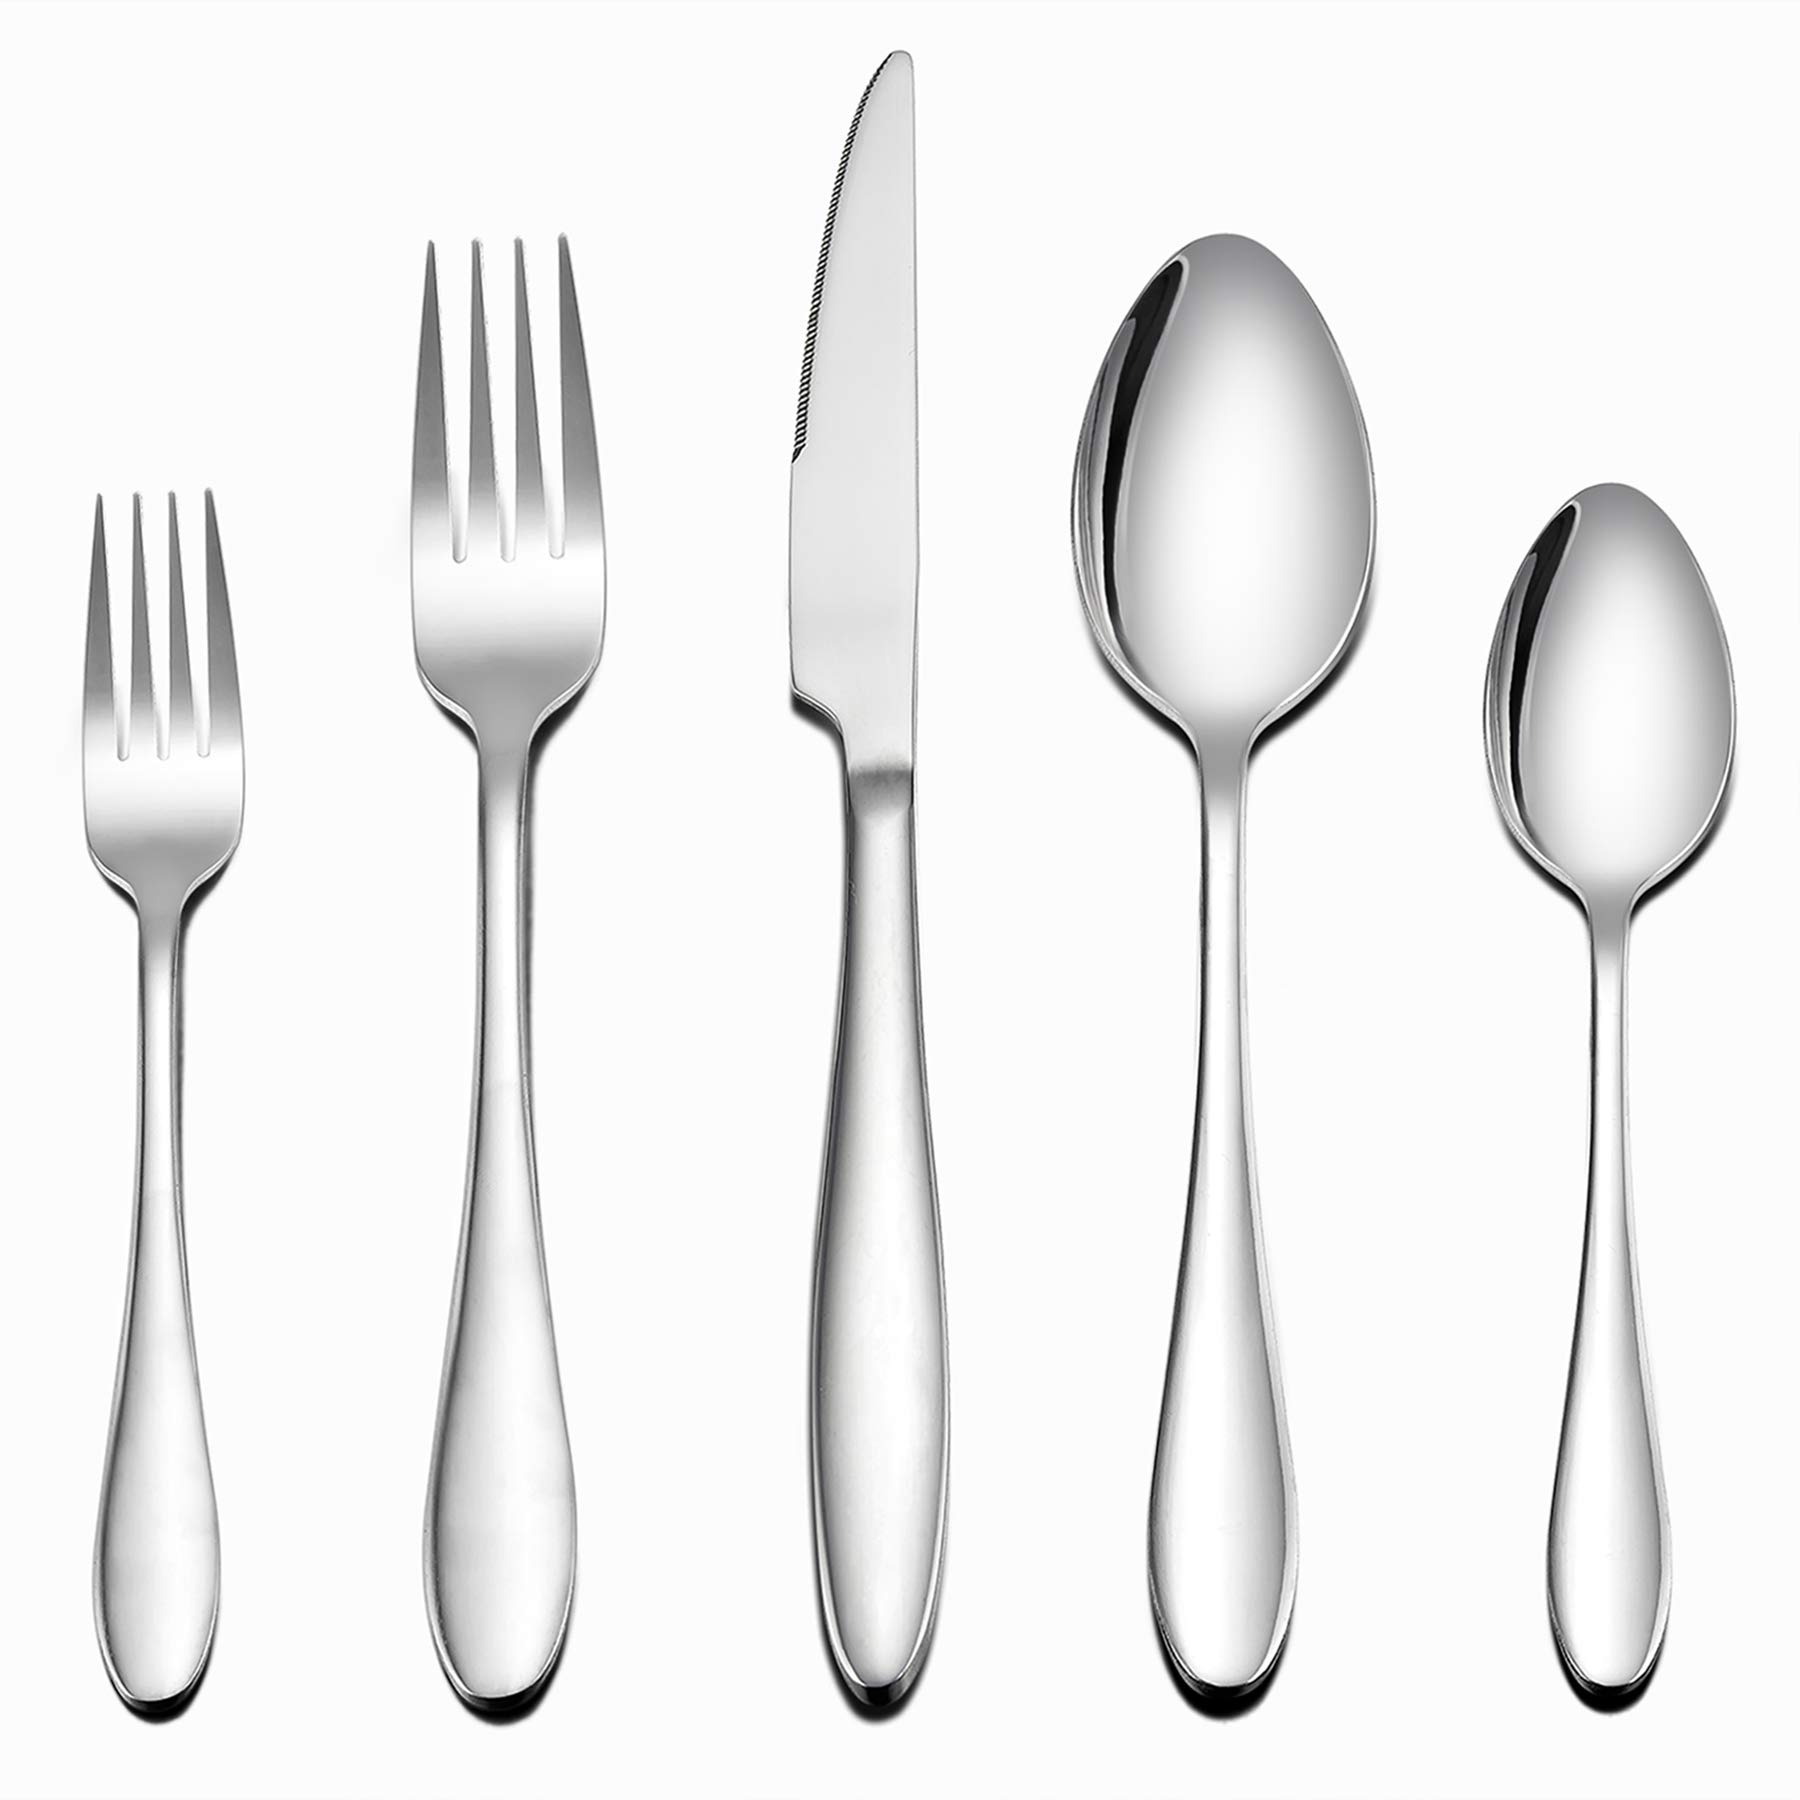 LIANYU 60-Piece Silverware Flatware Set for 12, Stainless Steel Home Kitchen Hotel Restaurant Cutlery Set, Eating Utensils, Mirror Finished, Dishwasher Safe